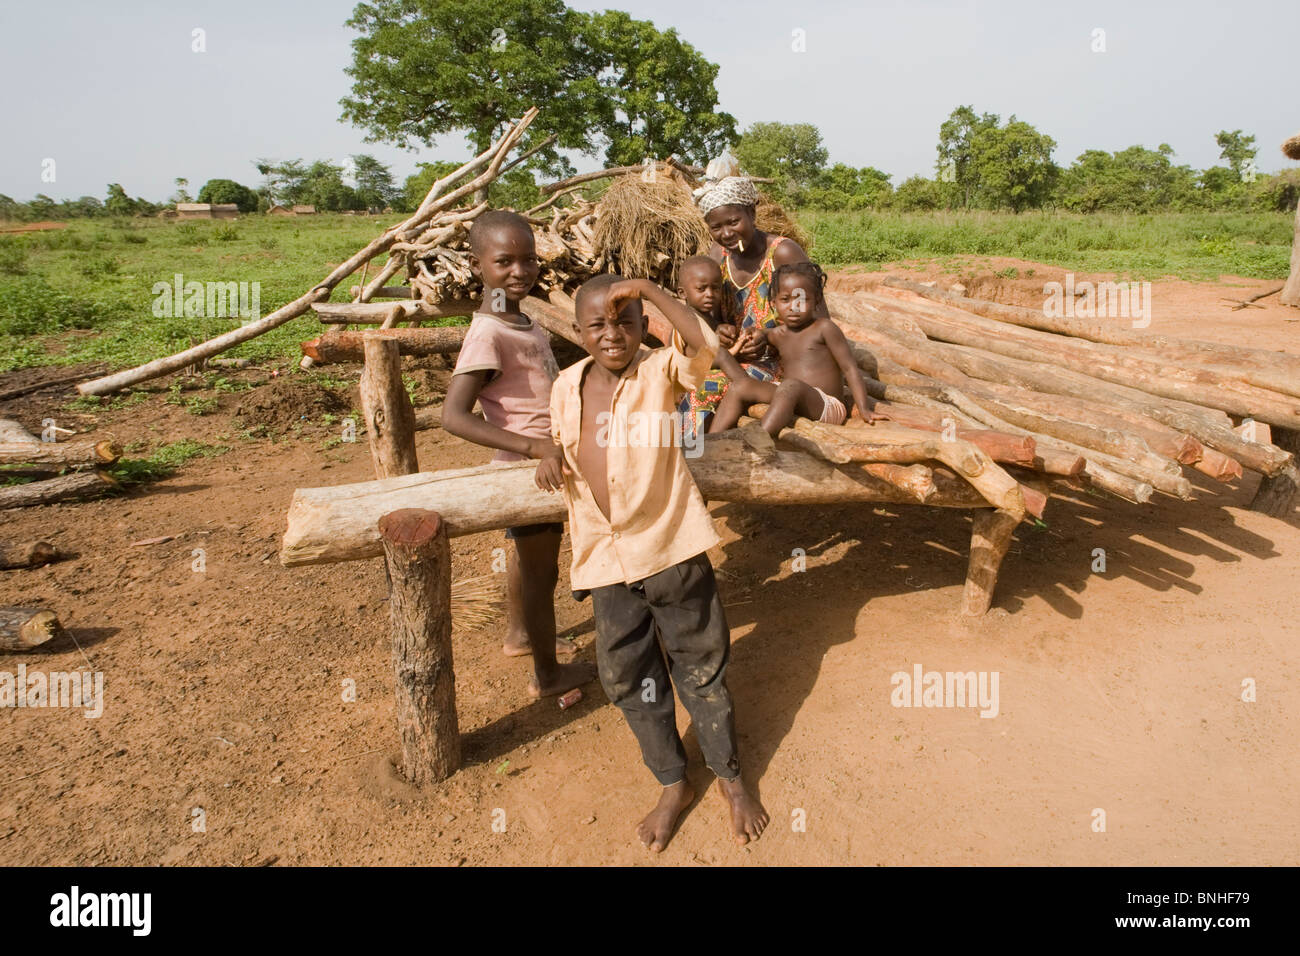 Bemobah family at the village of Sor No. 1, Gonja triangle, Damango district, Ghana. - Stock Image